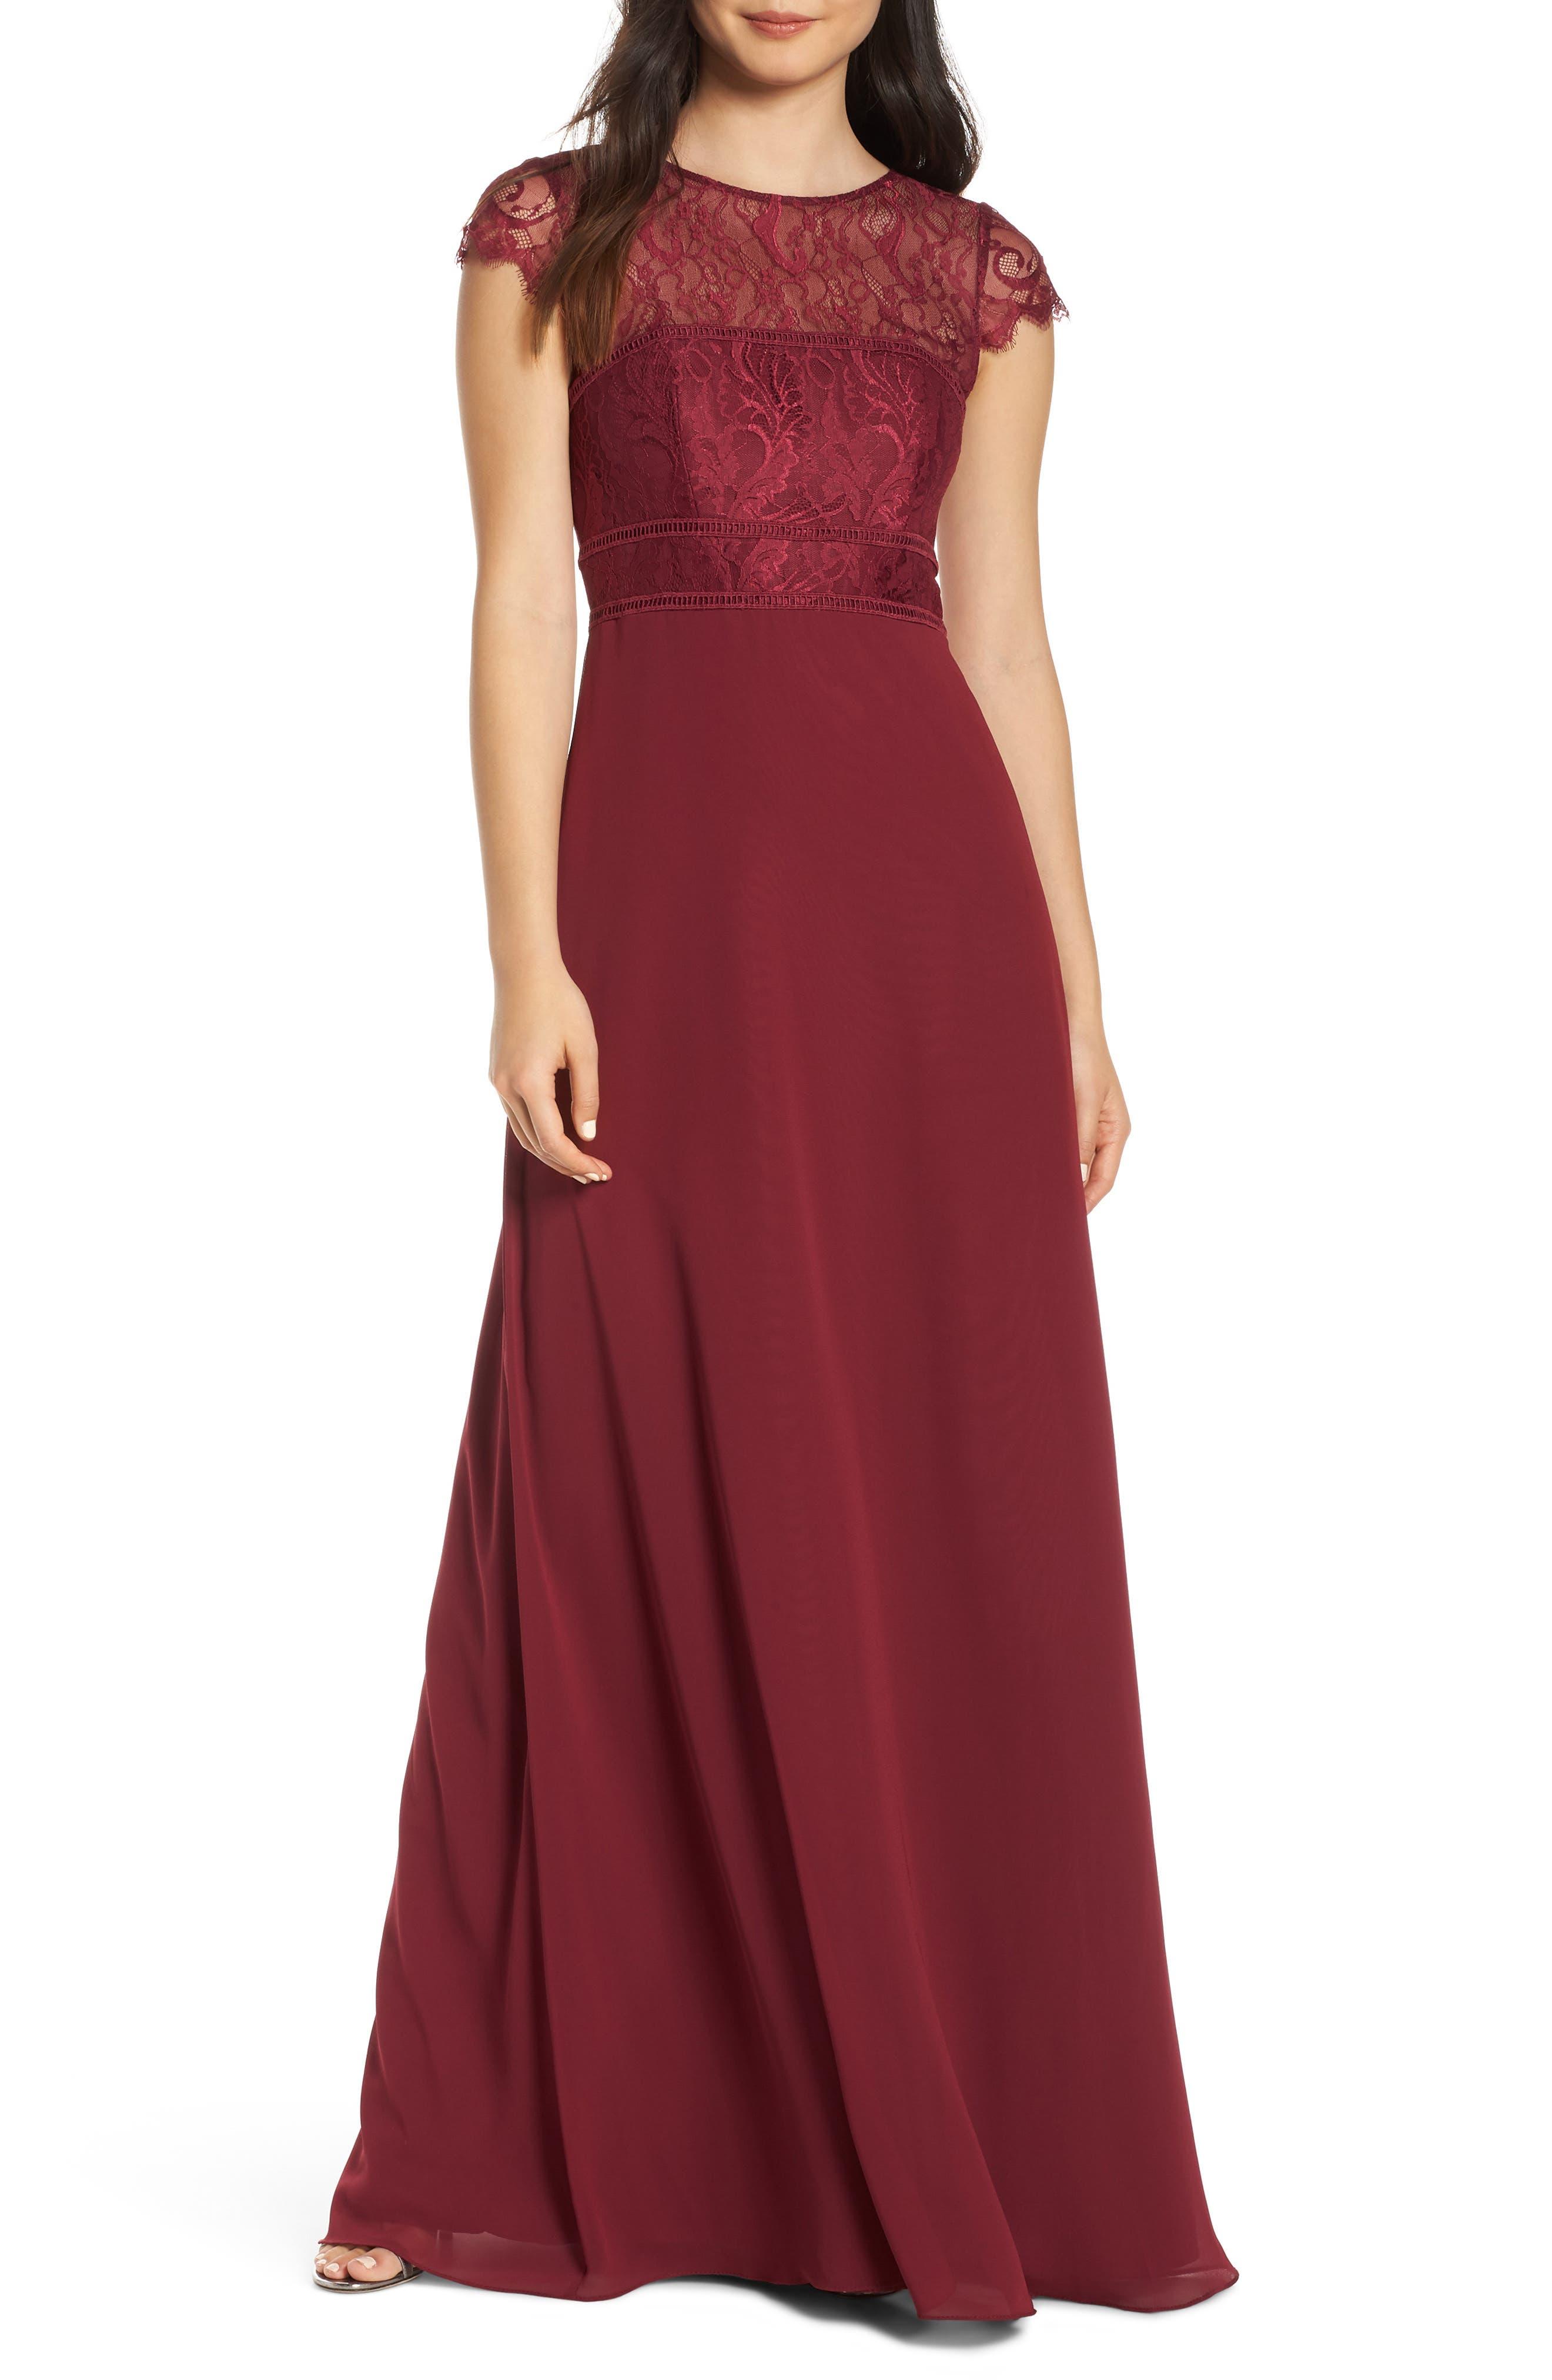 Hayley Paige Occasions Lace Bodice Chiffon Evening Dress, Burgundy